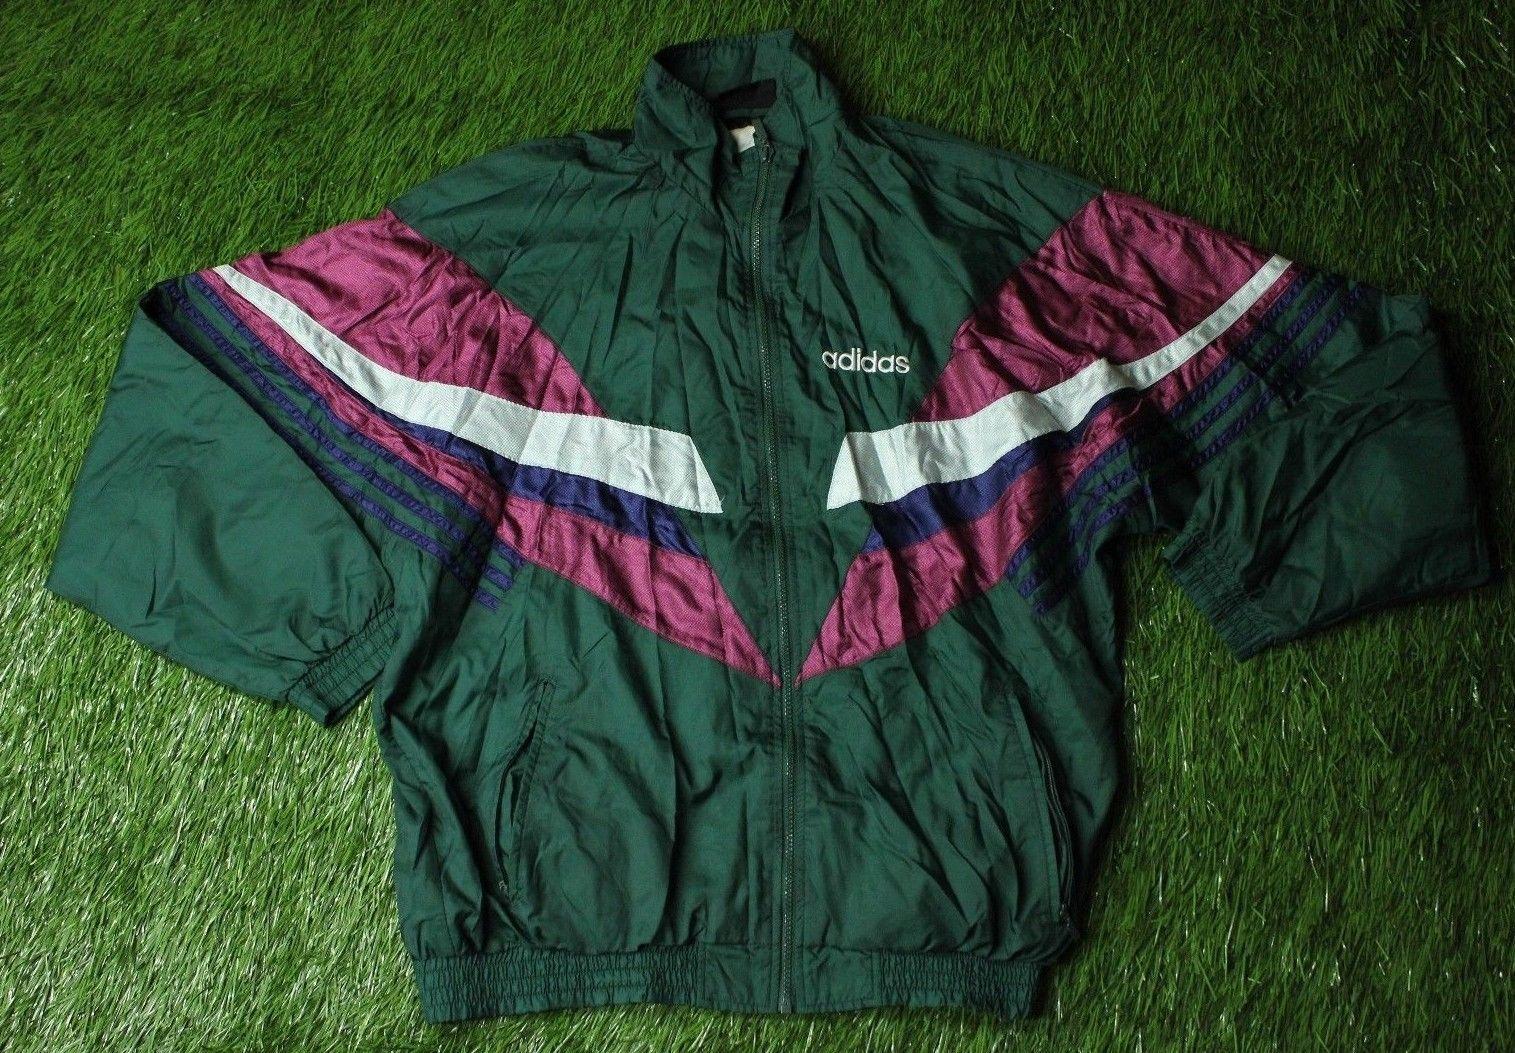 Adidas windbreaker track jacket silver black and Depop